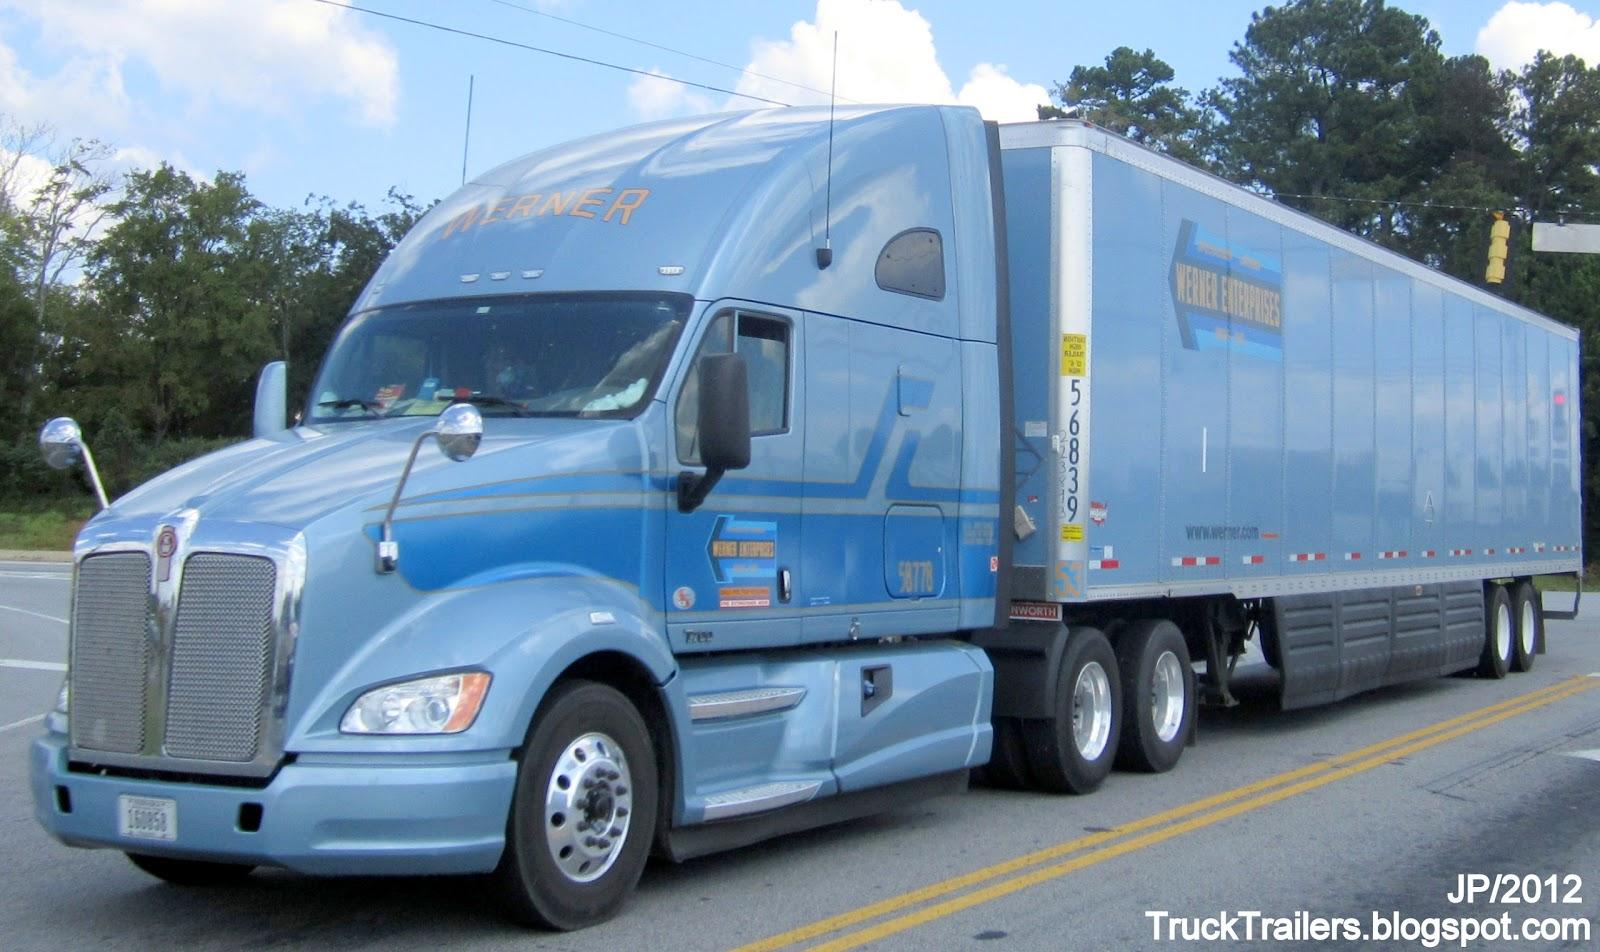 Werner enterprises omaha nebraska kenworth blue sleeper cab truck dry van skirted trailer werner trucking company